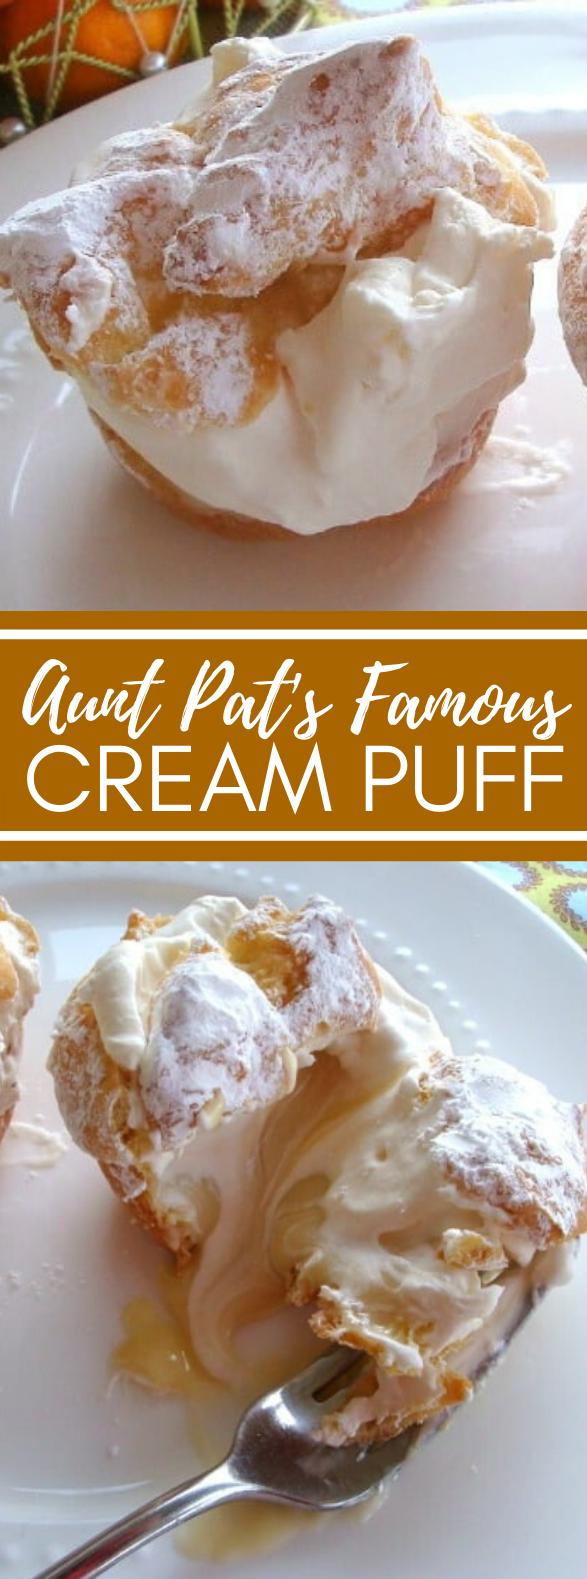 AUNT PAT'S FAMOUS CREAM PUFF RECIPE #desserts #sweets